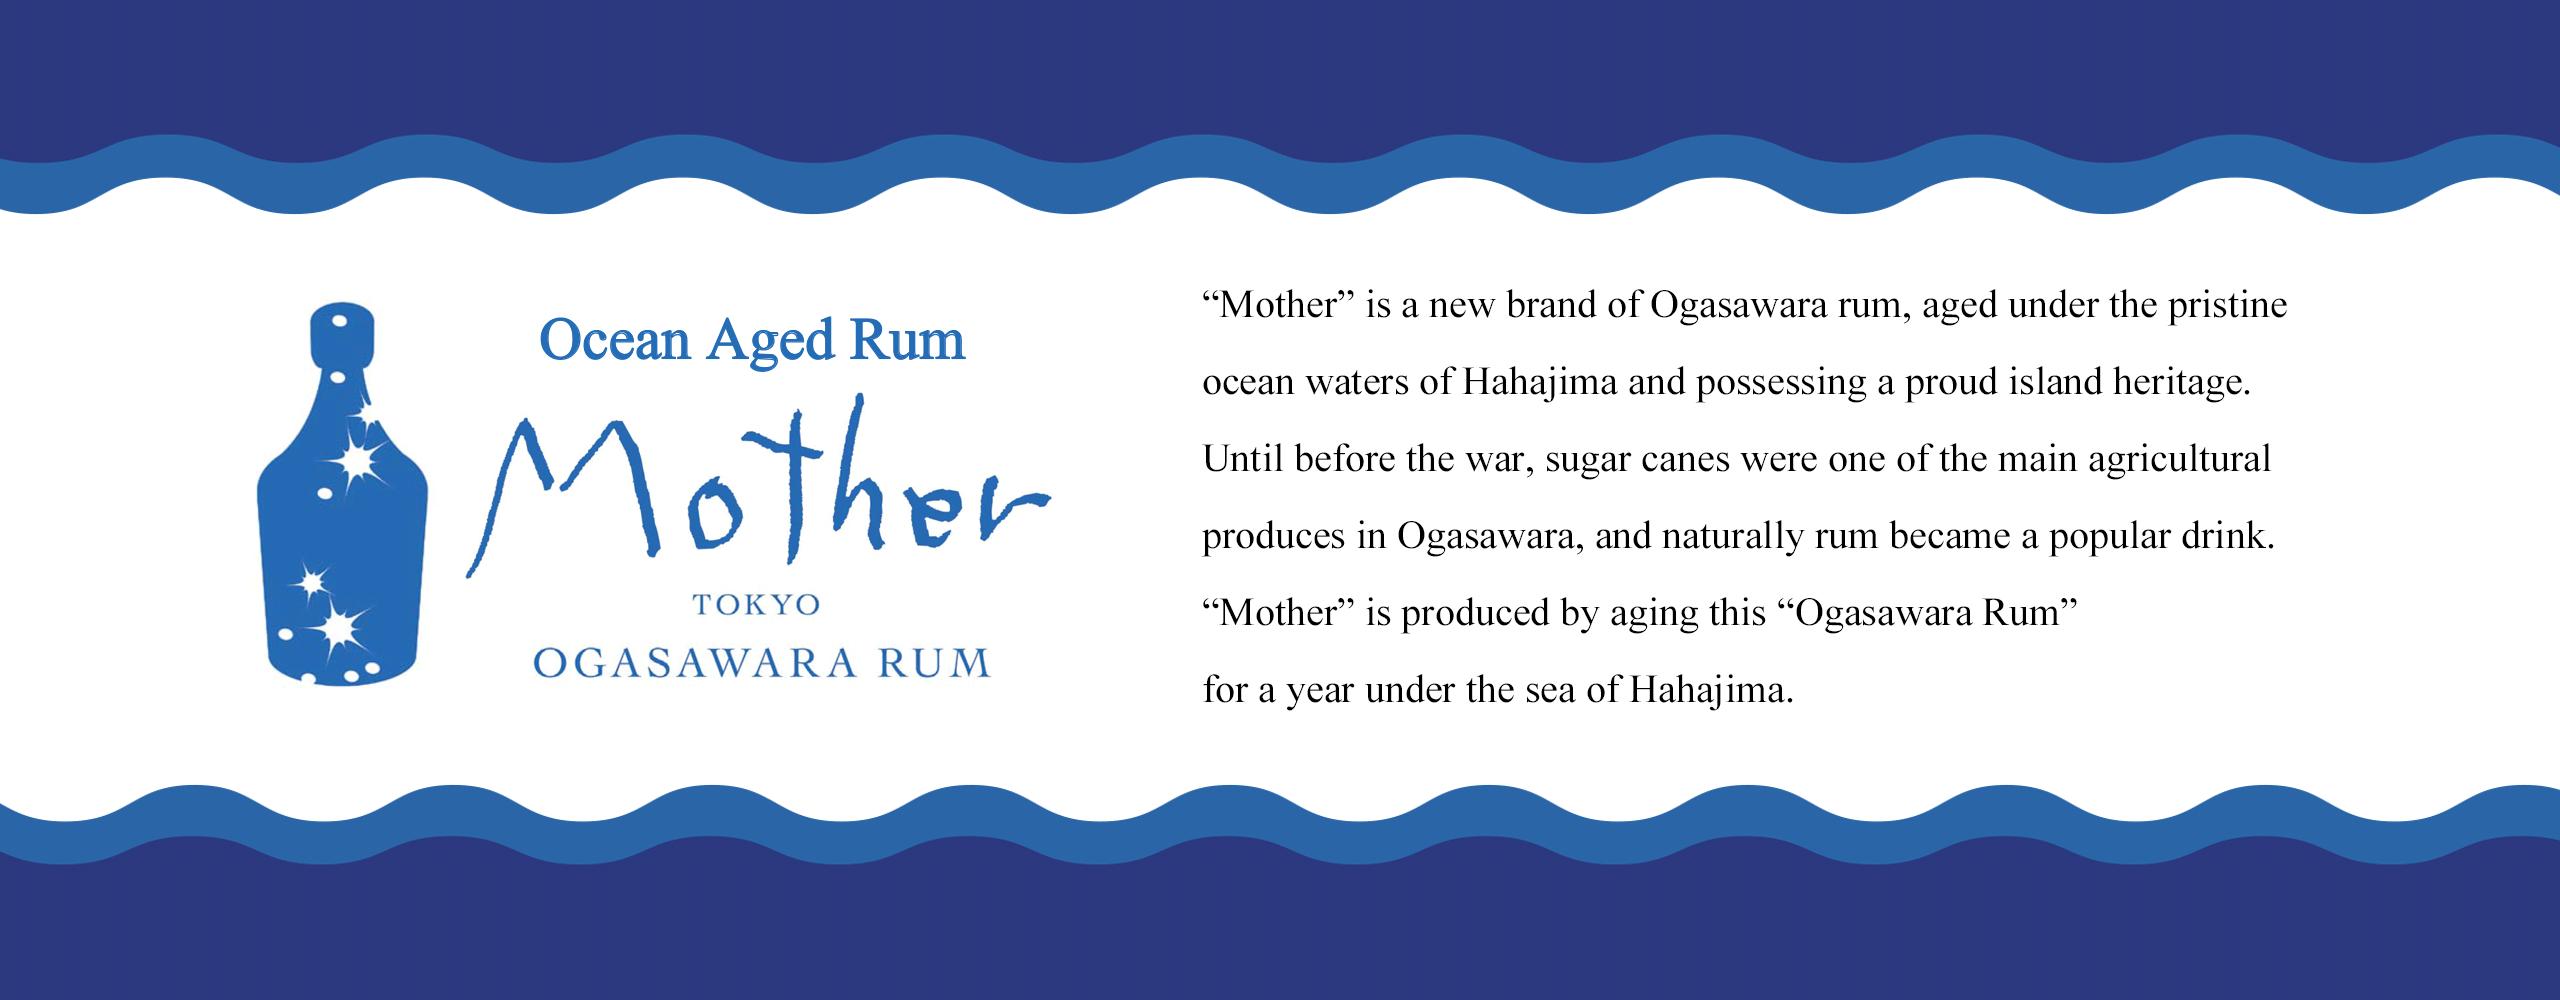 Ocean Aged Rum Mother